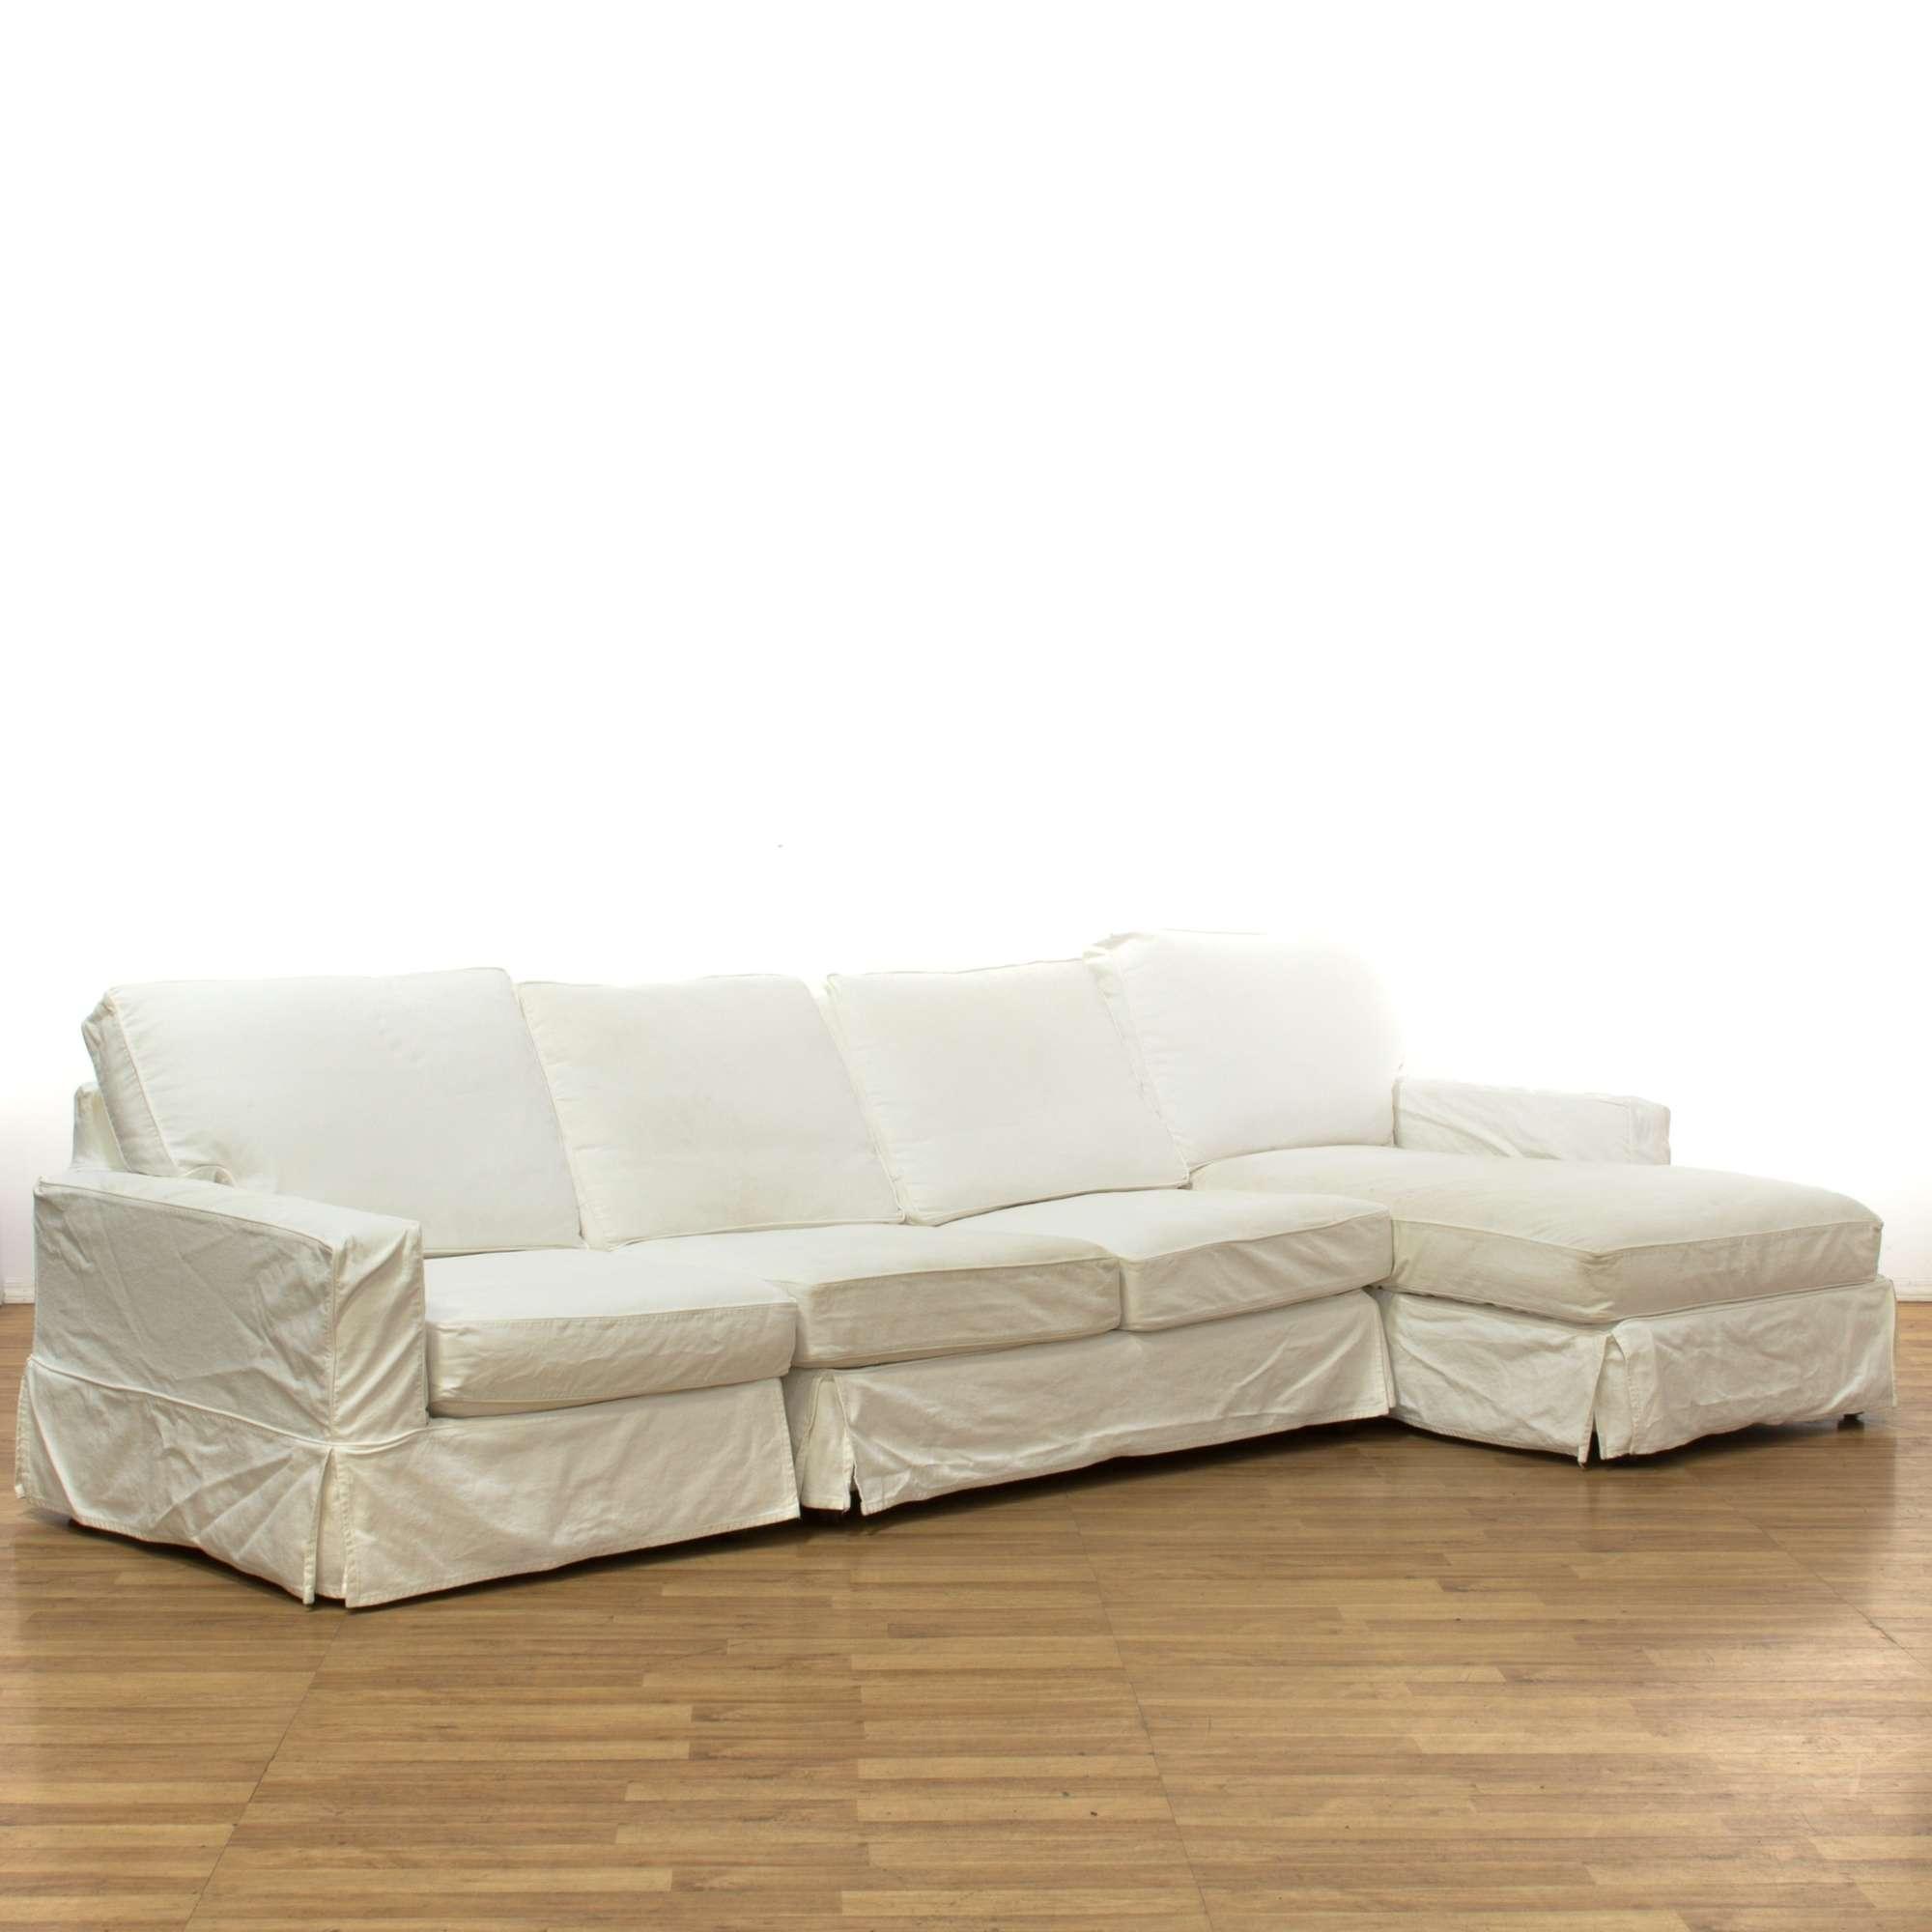 Incredible Pottery Barn White Denim Sectional Couch Loveseat Vintage Creativecarmelina Interior Chair Design Creativecarmelinacom